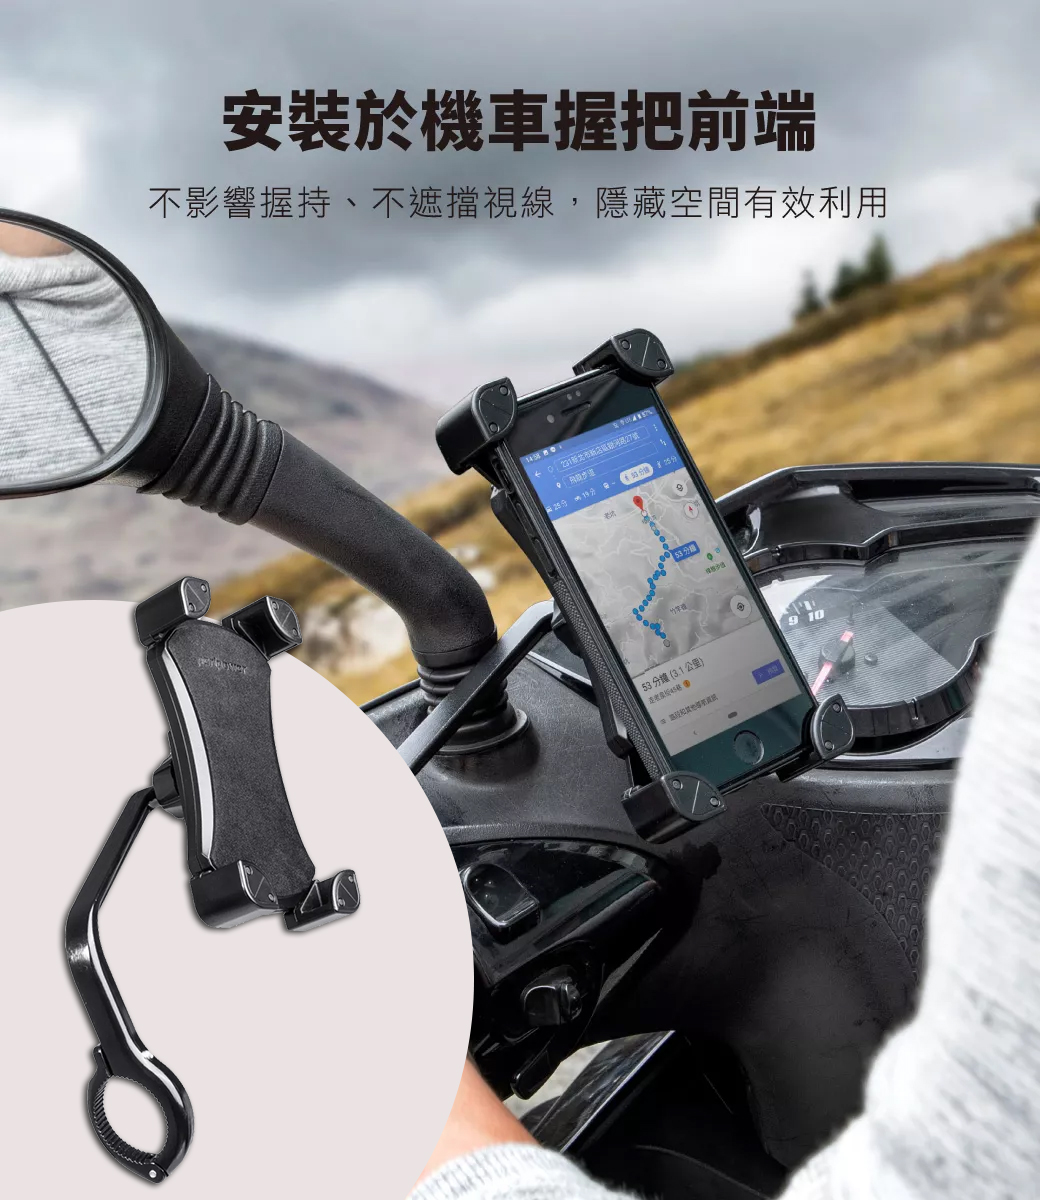 【peripower】MT-MC01 握把式鋁合金機車手機架 鋁合金材質 手機支架 單車支架 握把支架 手把架 握把架